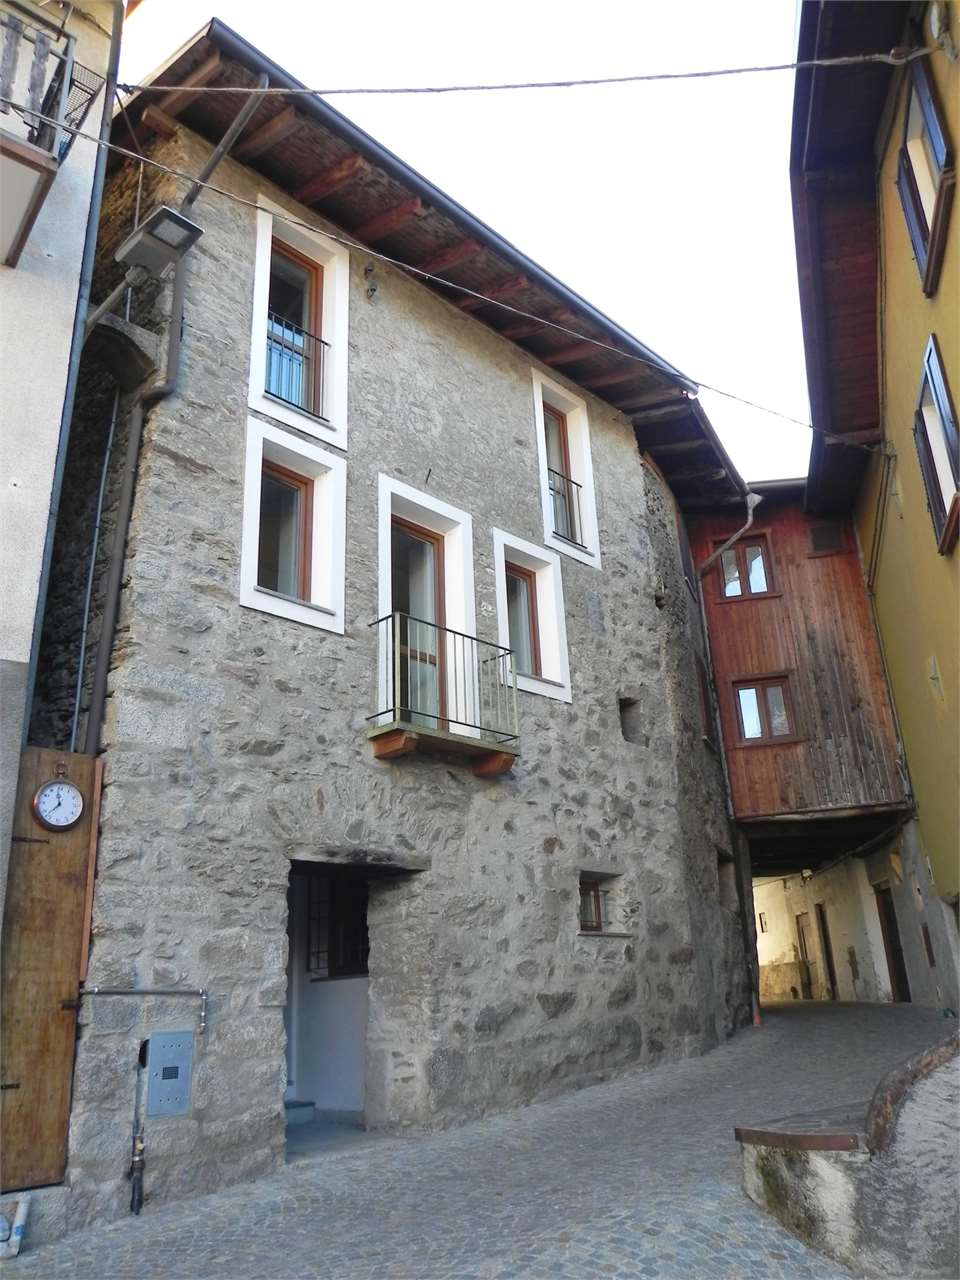 Vendita Casa Indipendente Casa/Villa Cevo via umberto i  268666